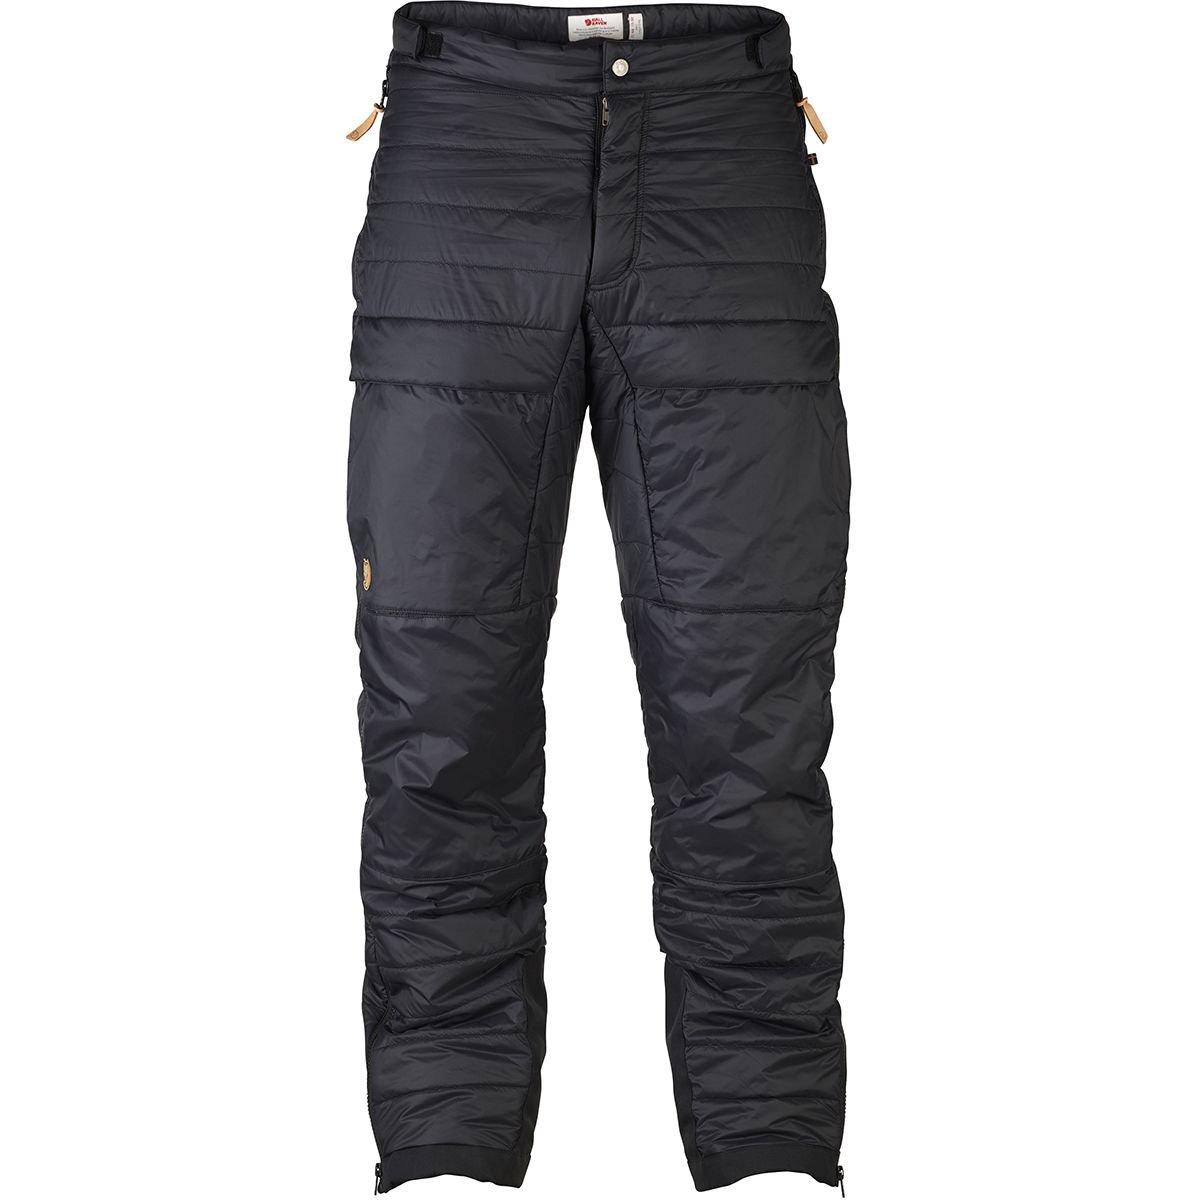 Fjällräven Keb Touring Padded Trousers Men - Warme Thermohose